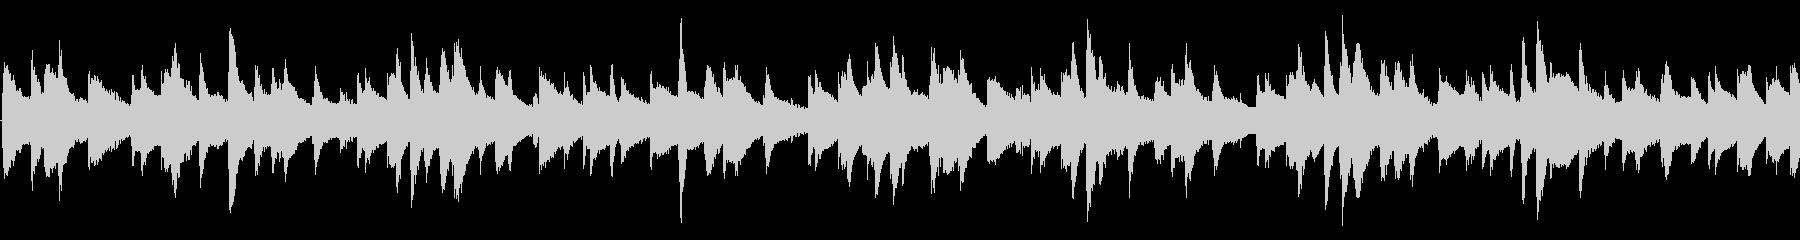 Lo-fi HipHop ループの未再生の波形